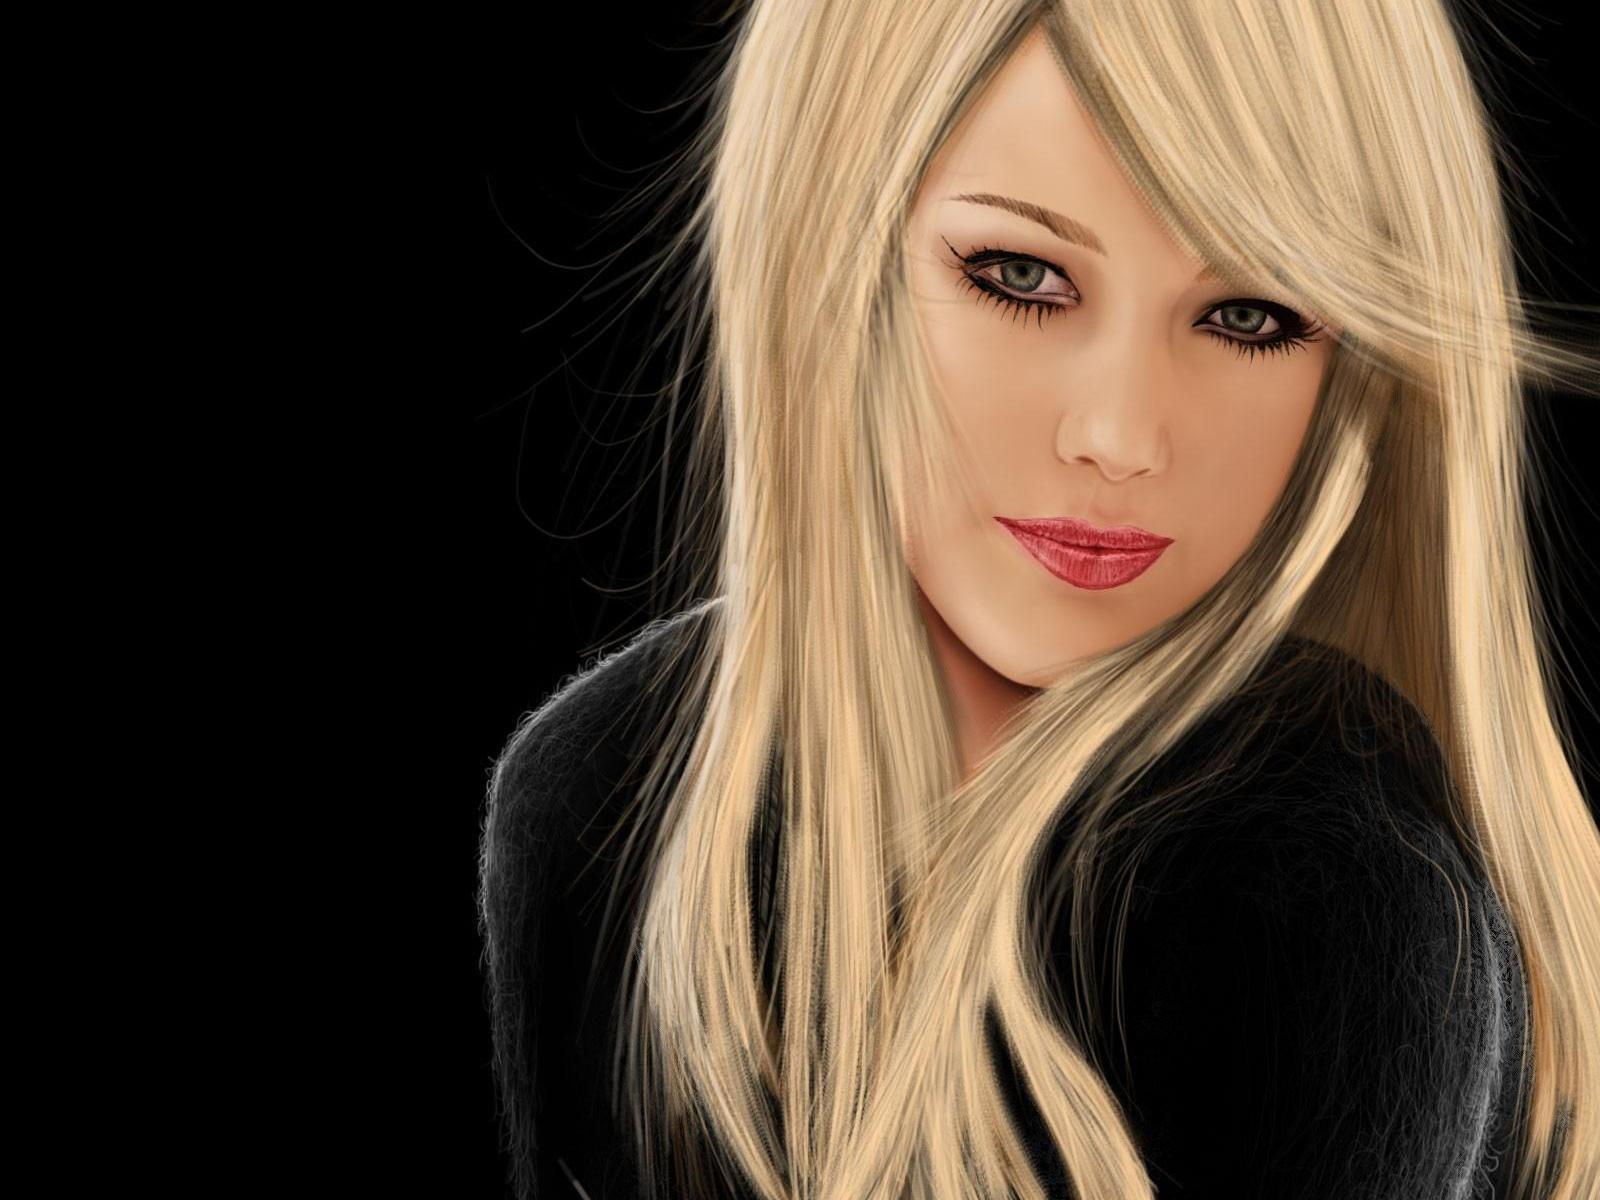 Симпатичная девушка блондинка